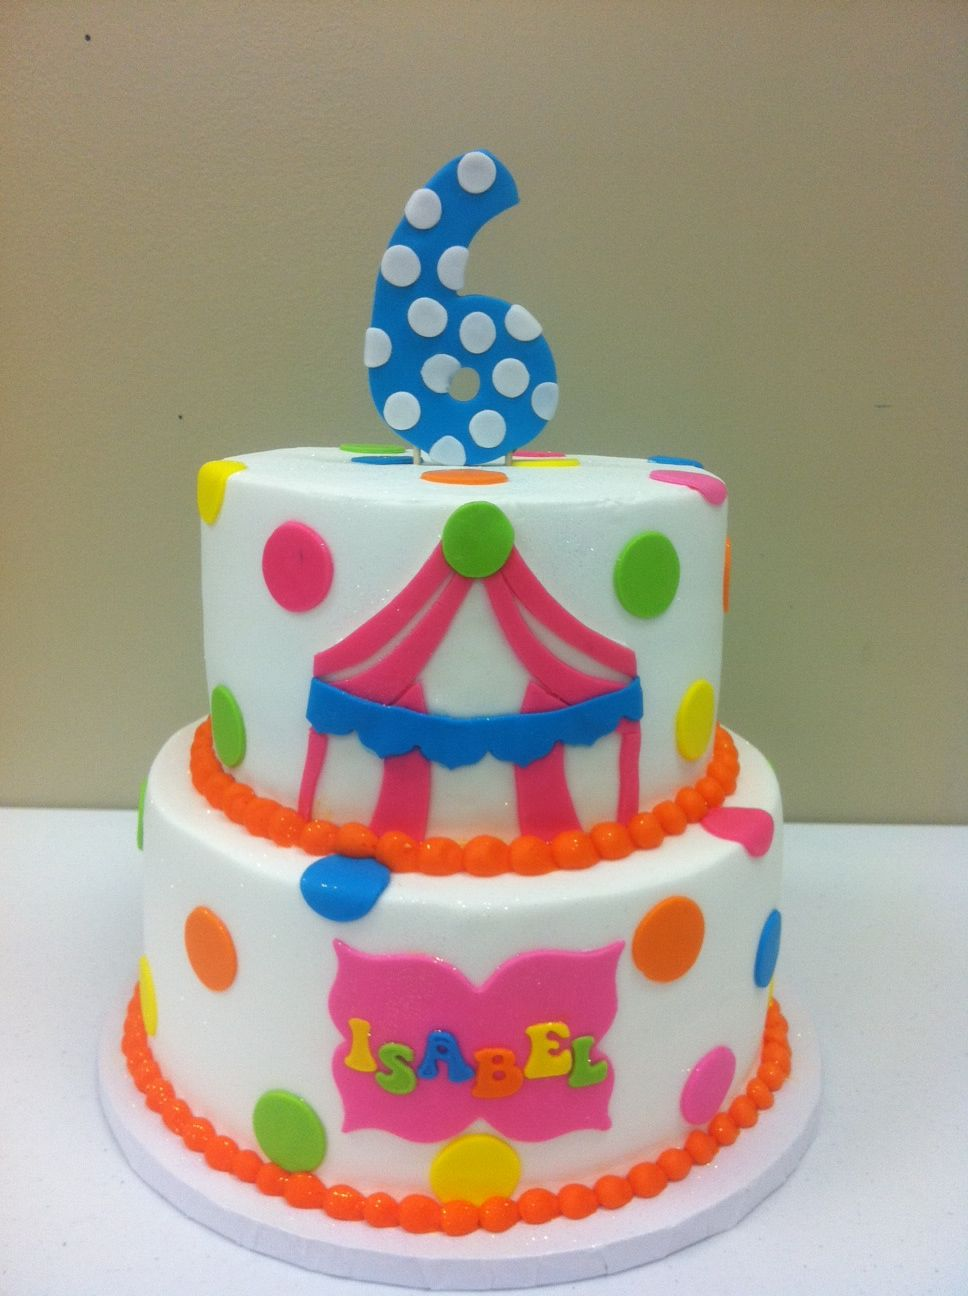 Carnival Cake allthingscakeshopcom Tulsa OK Cake Ideas To Try